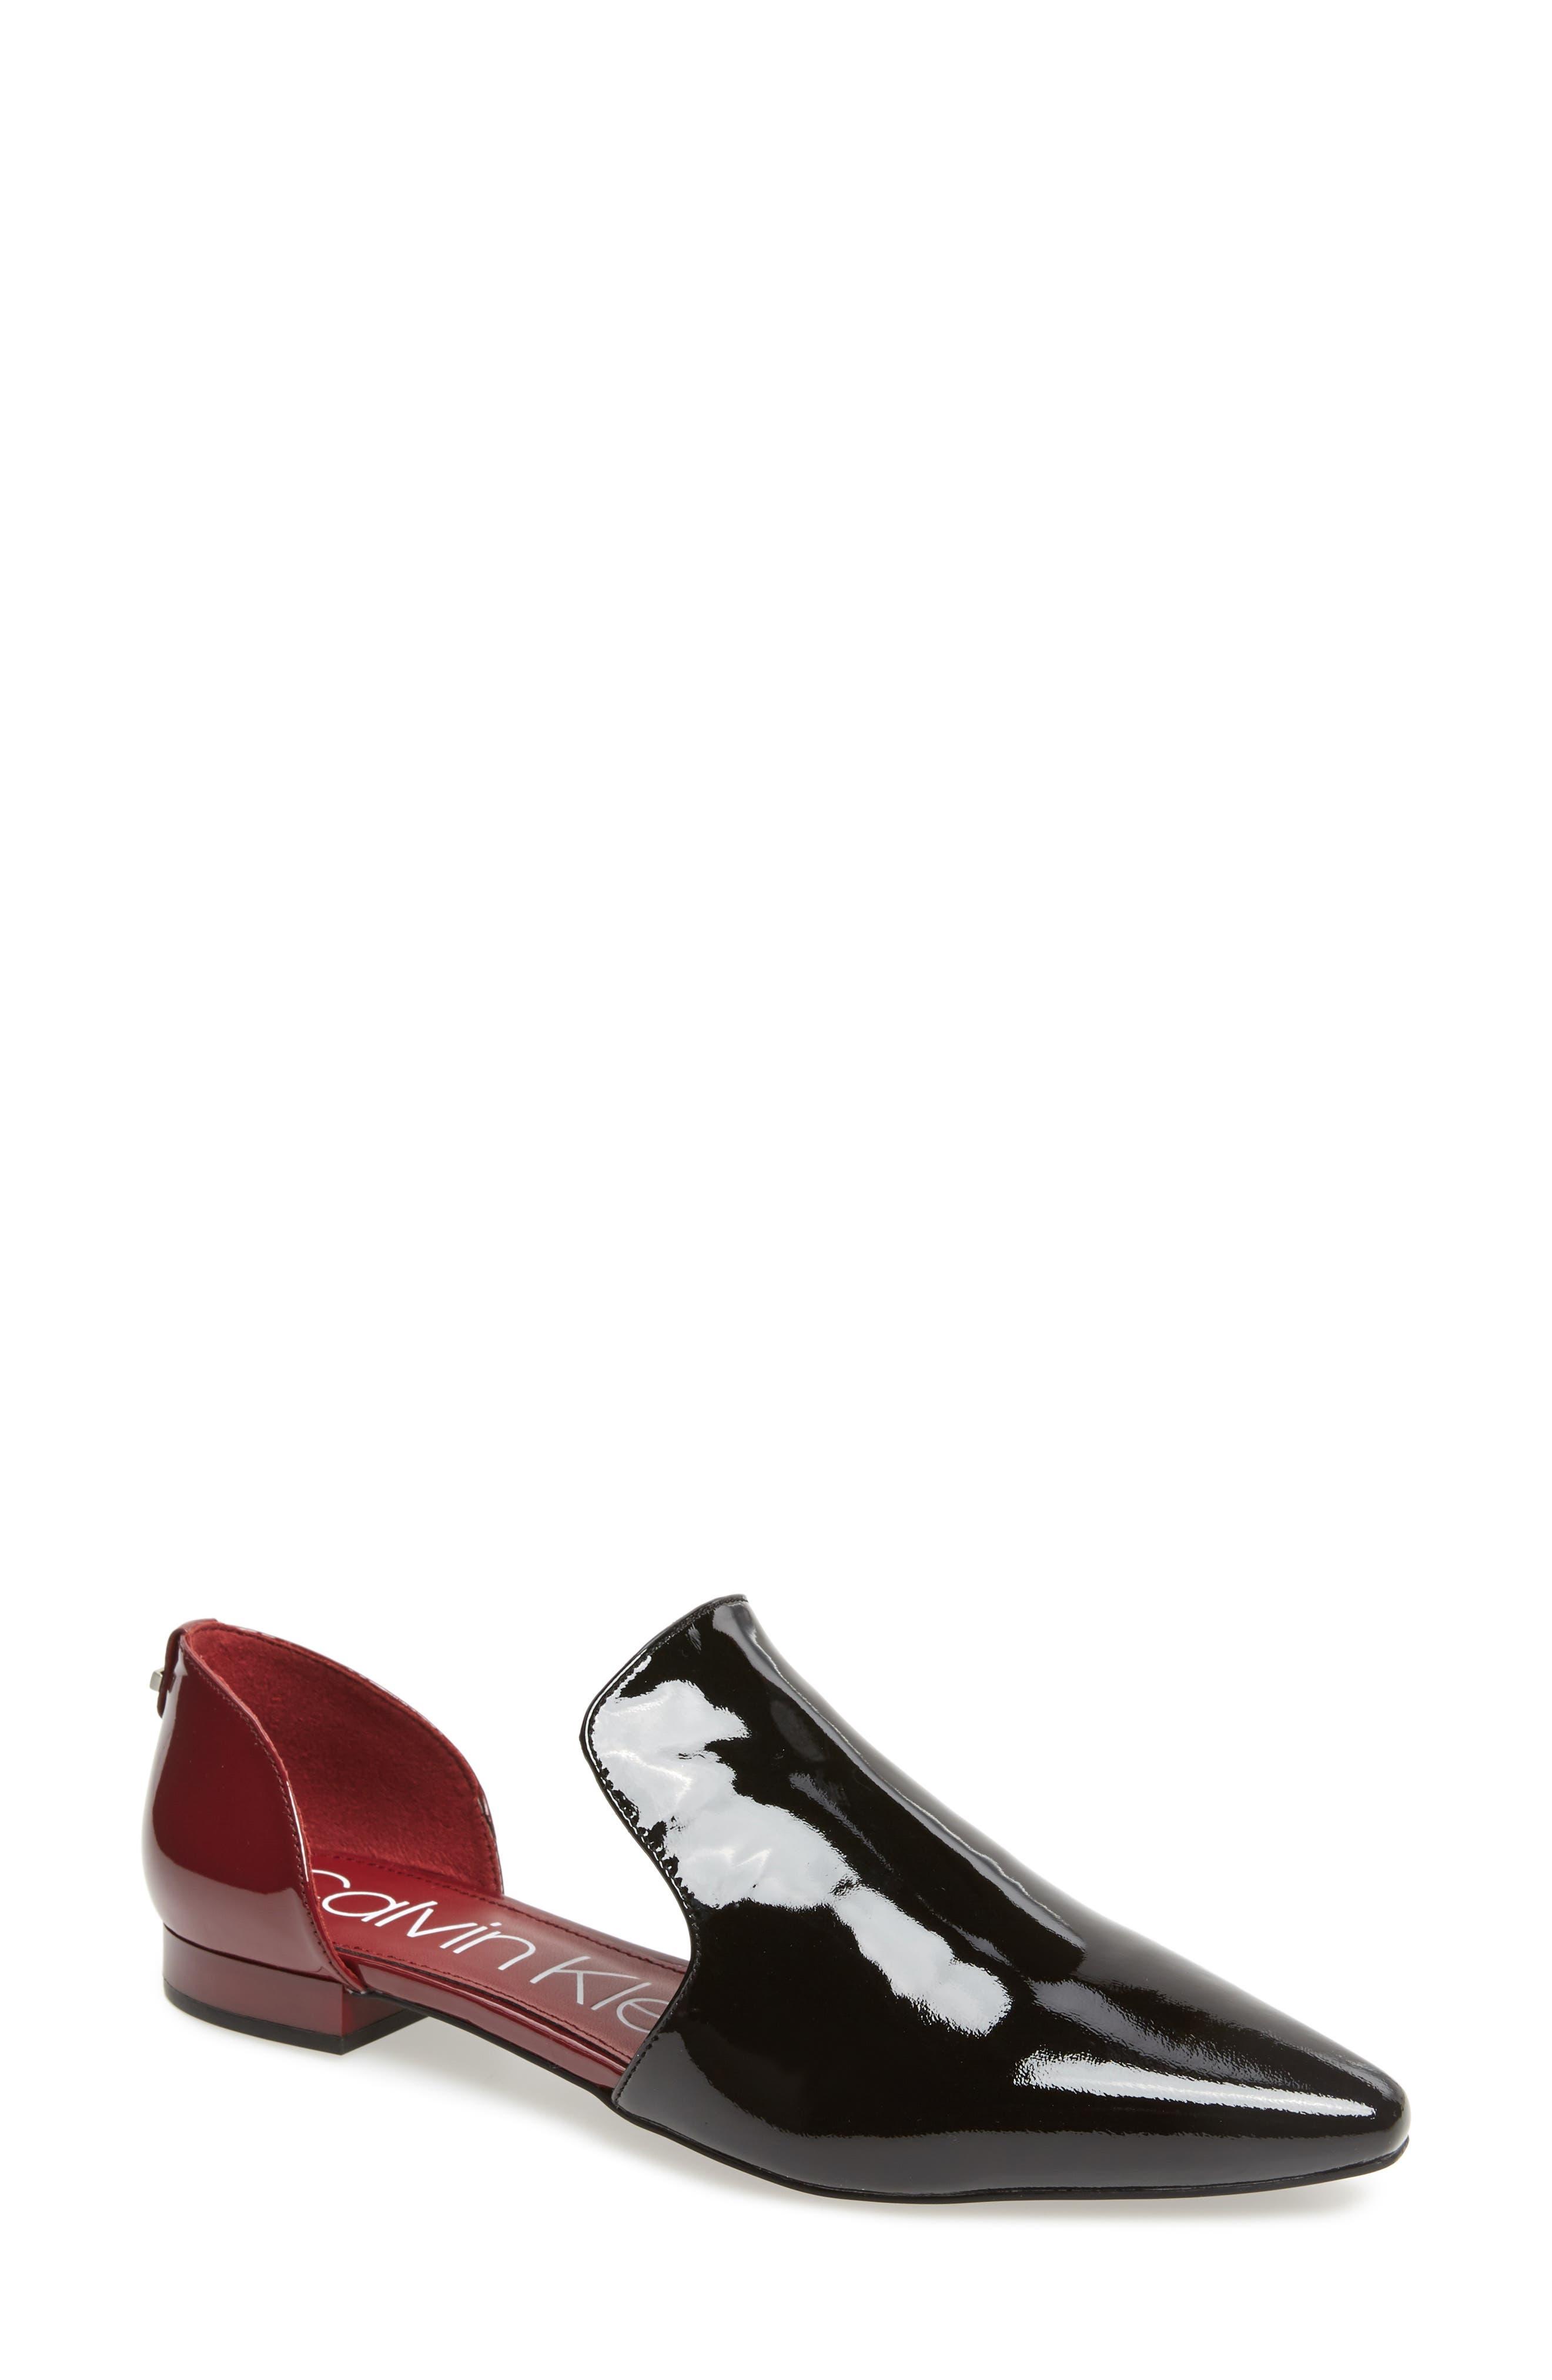 Edona Loafer Flat,                             Main thumbnail 1, color,                             BLACK/ RED ROCK PATENT